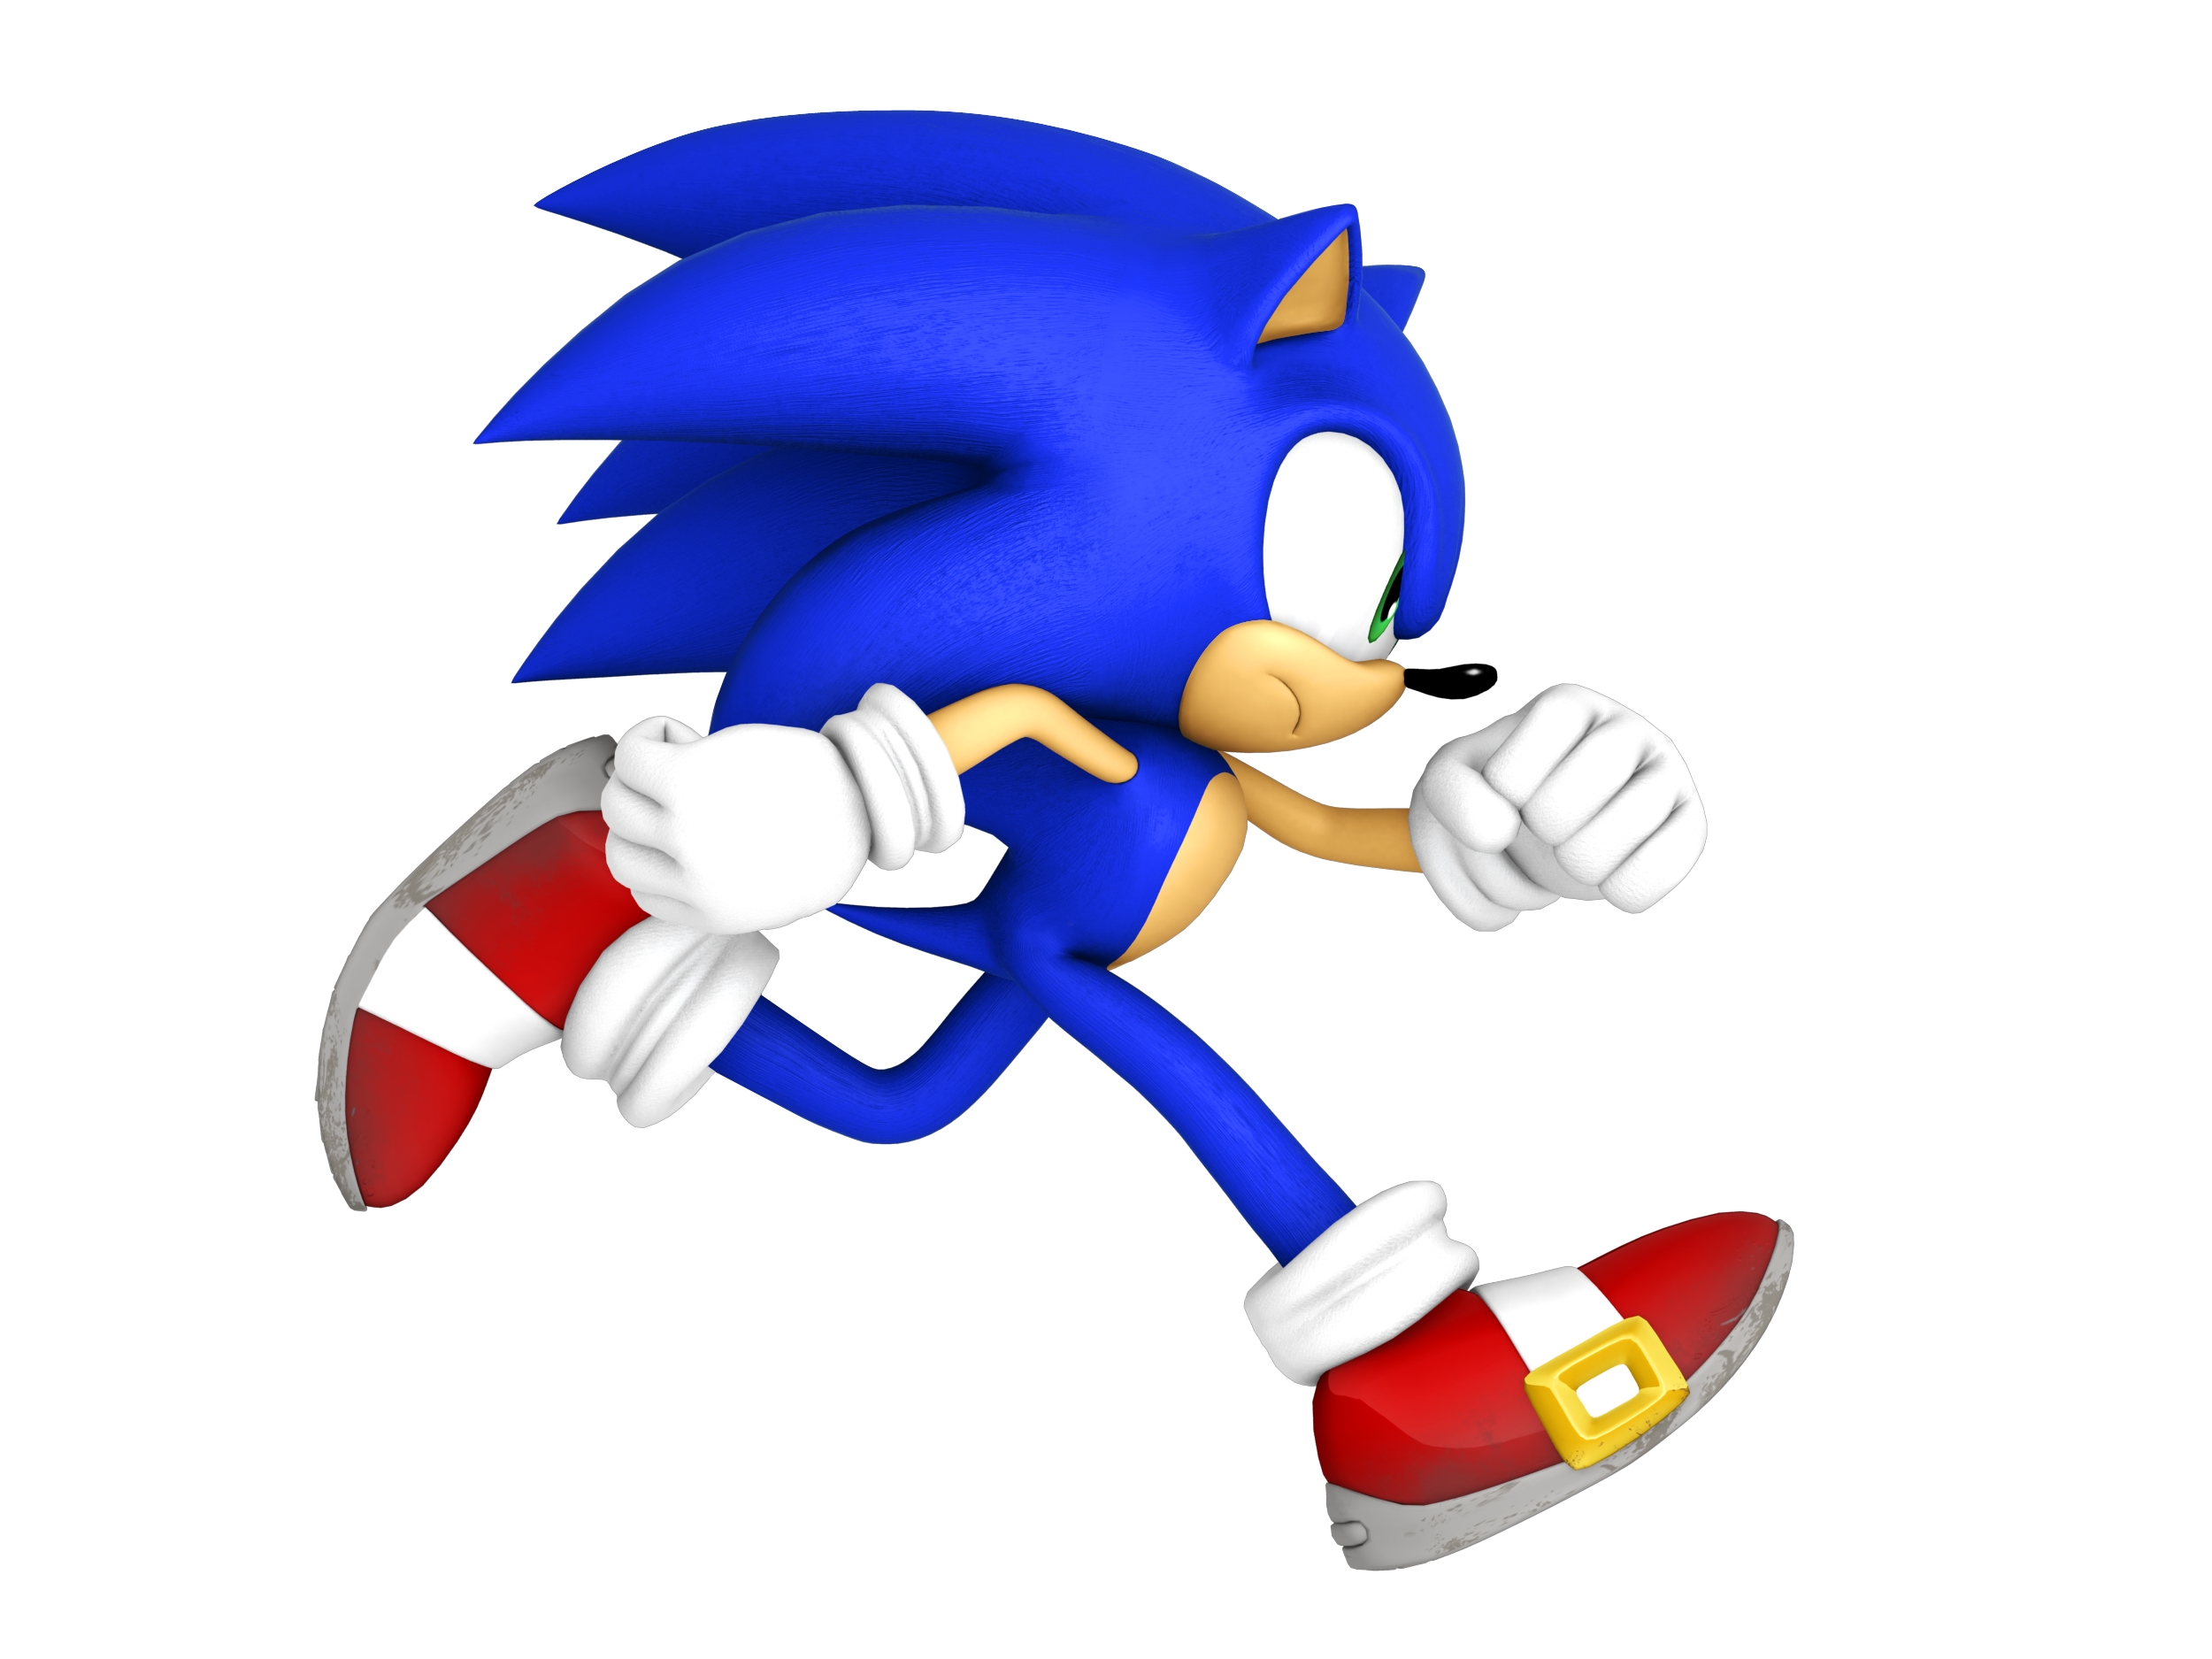 Sonic The Hedgehog 4 - Sonic Artwork - 2.png